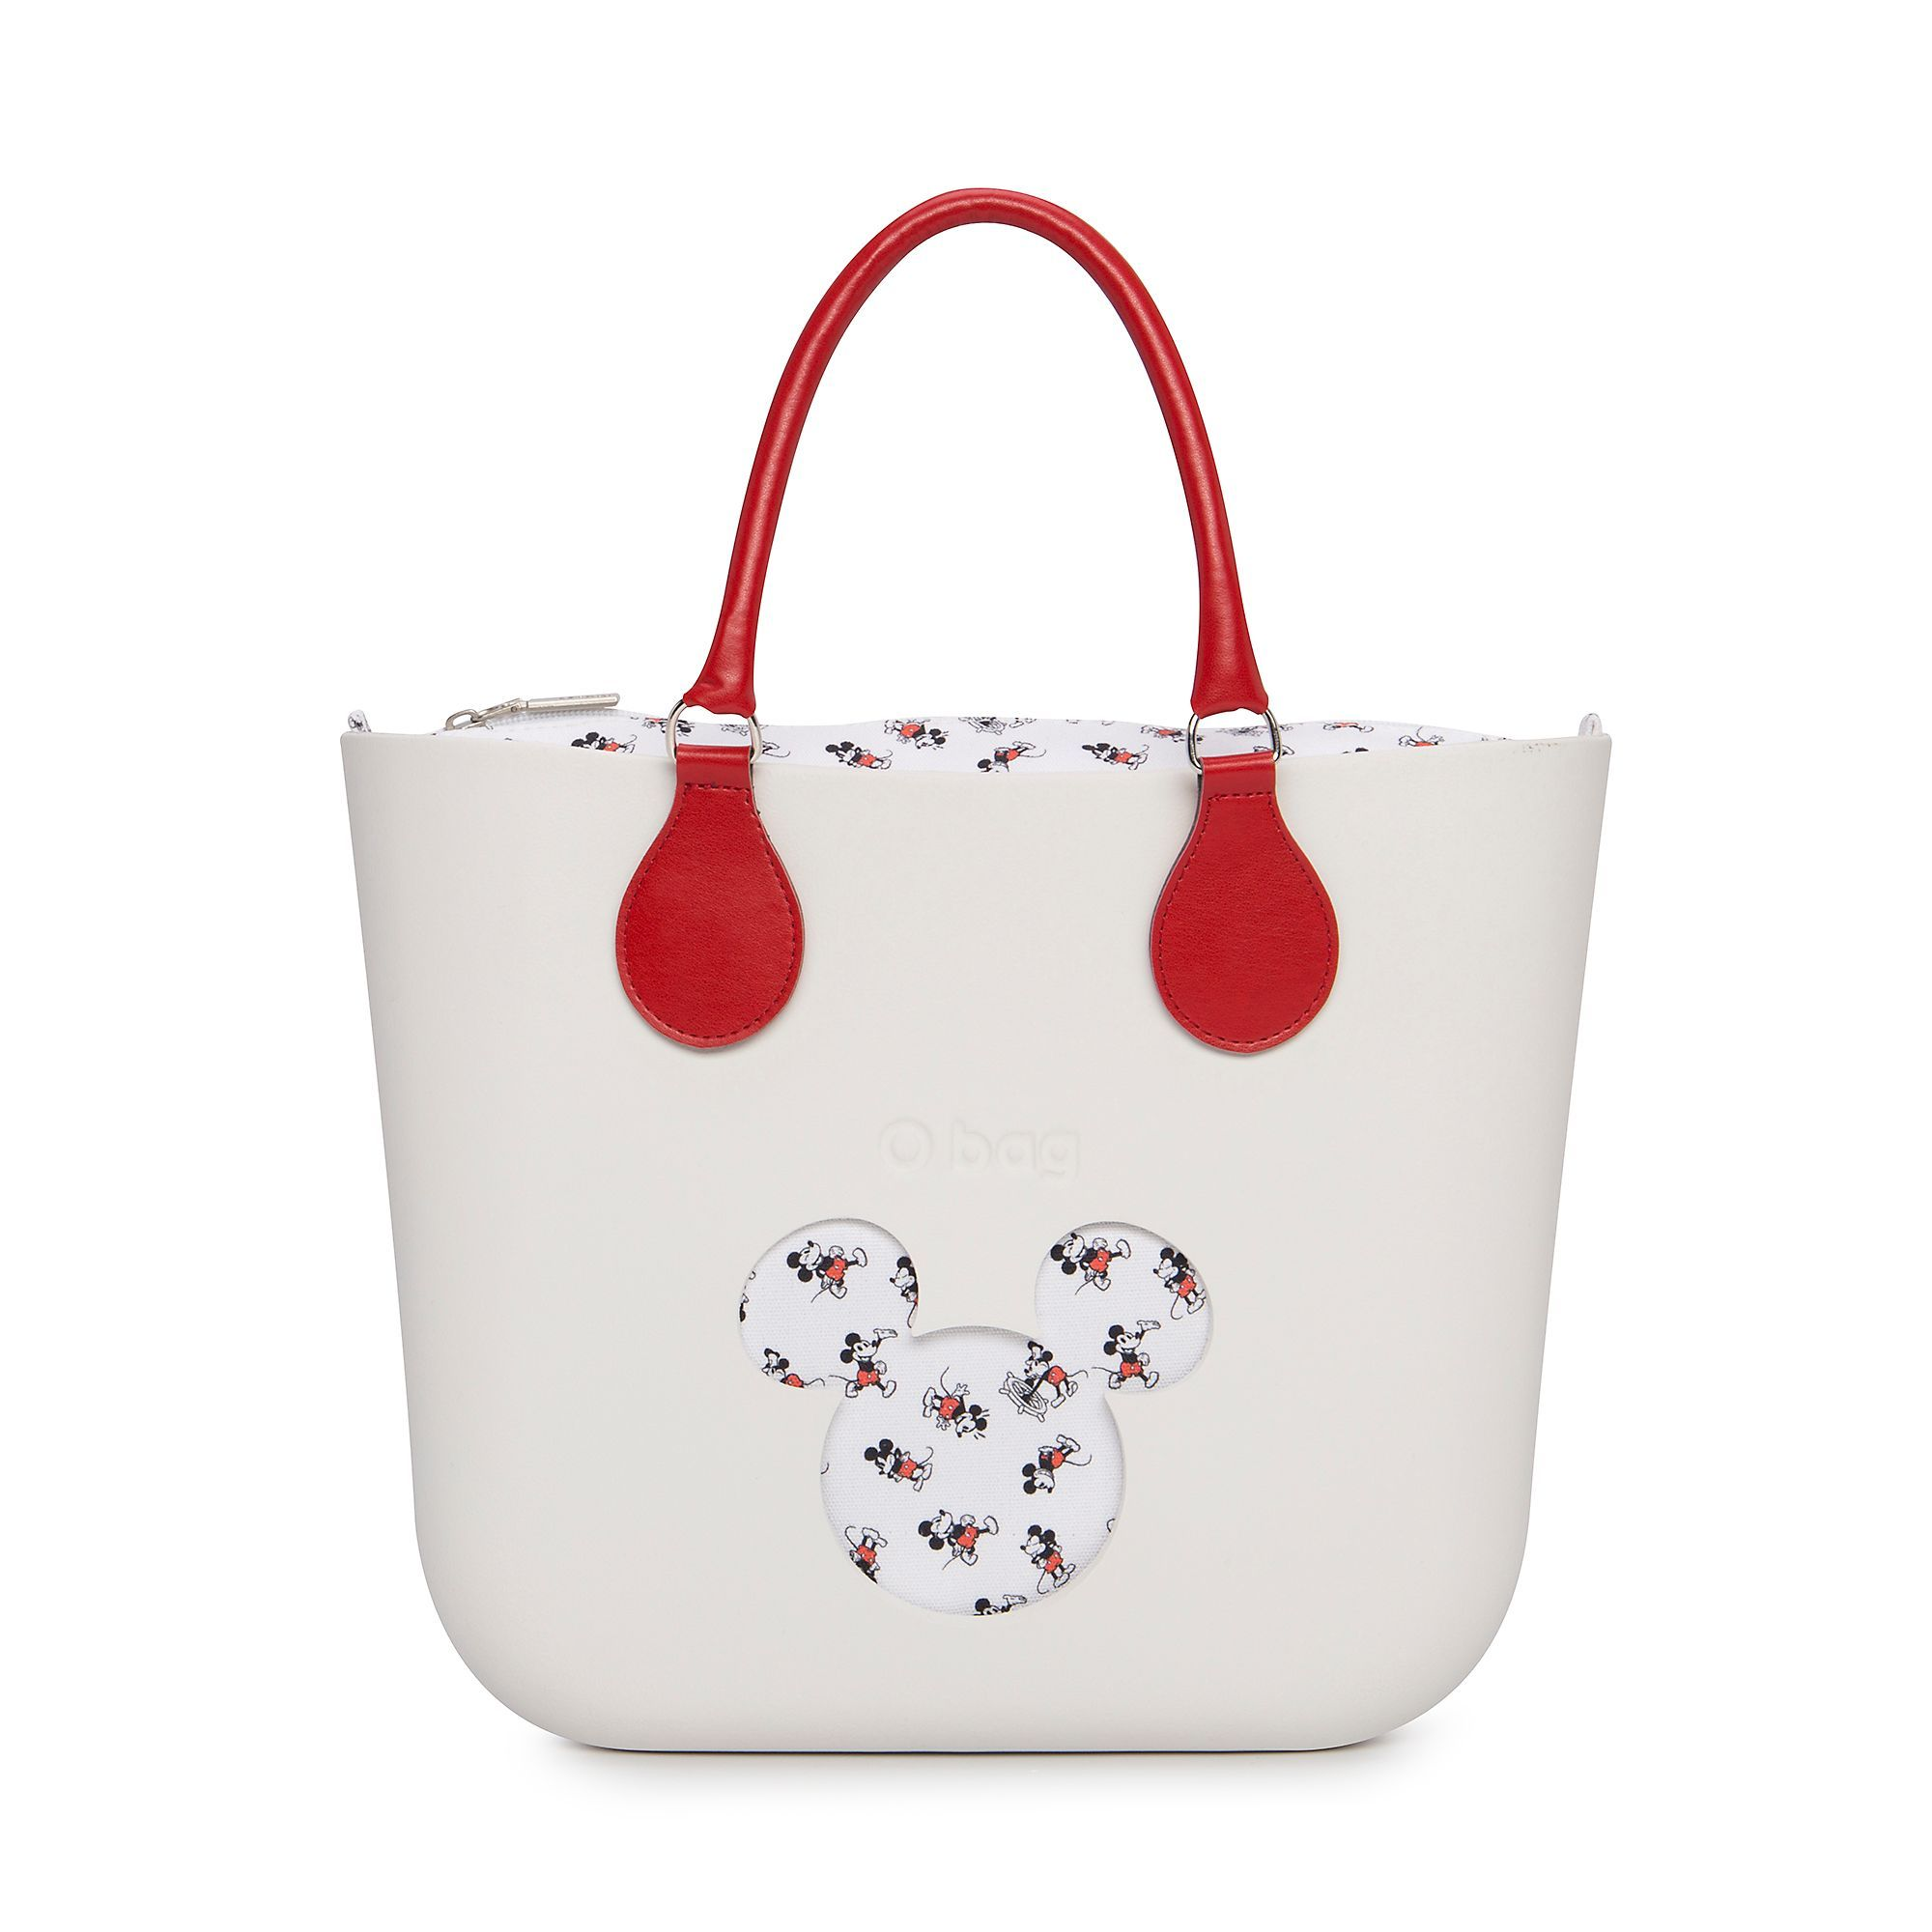 O Bag Mickey Mouse Mini White Handbag  da5c043749961